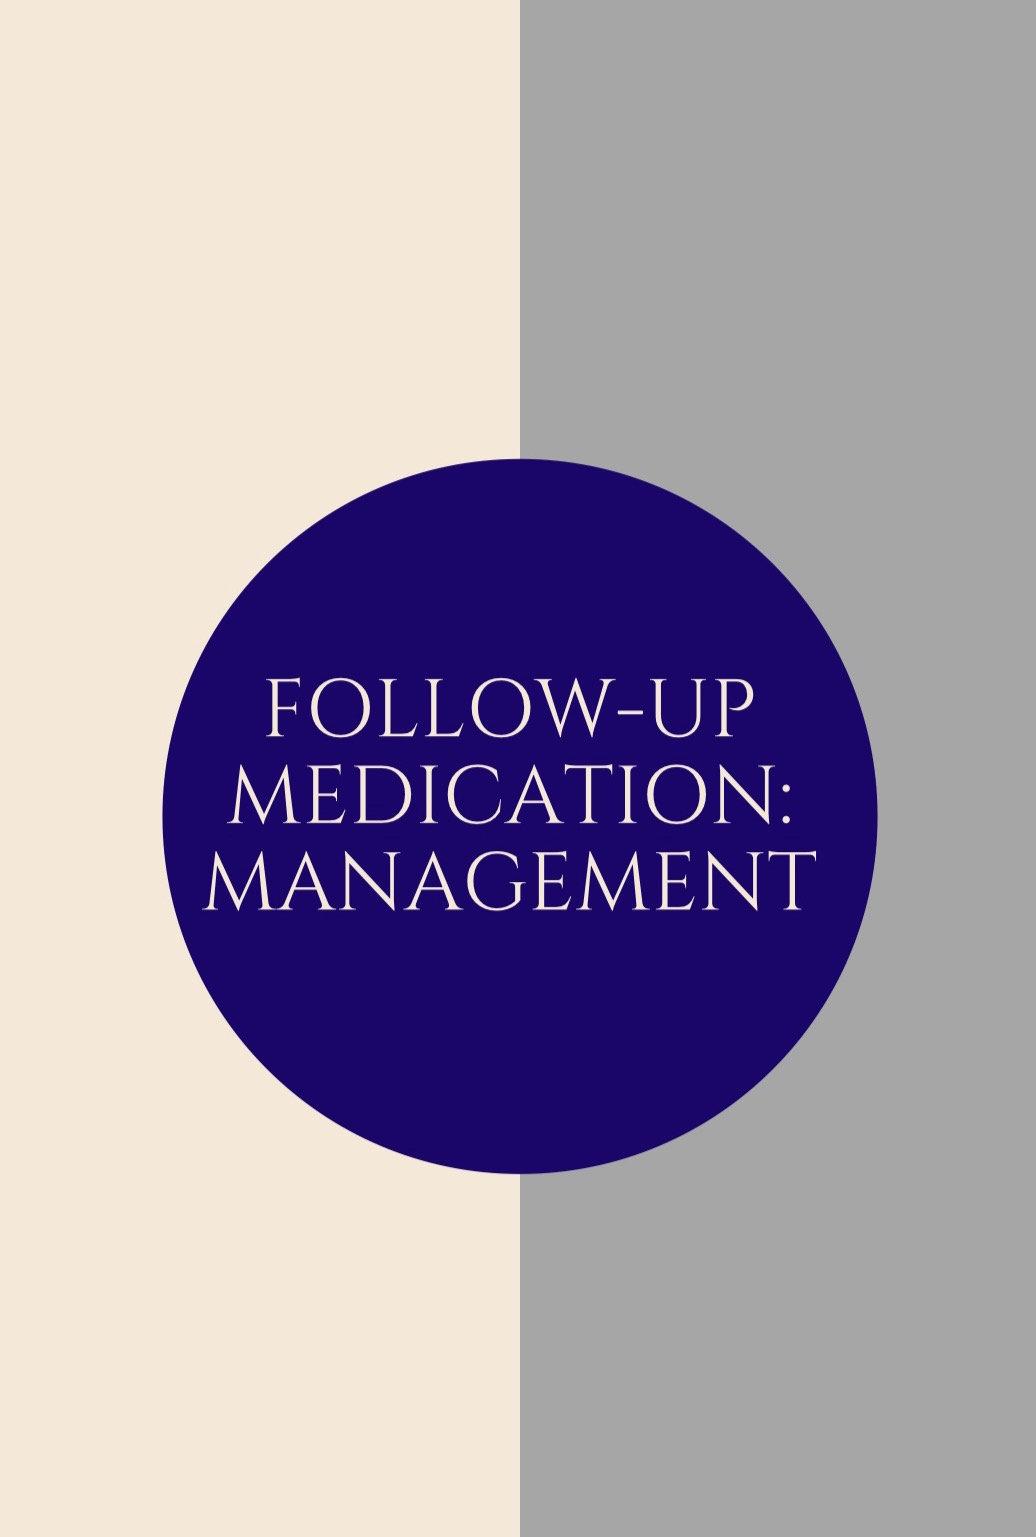 Follow-Up Medication: Management